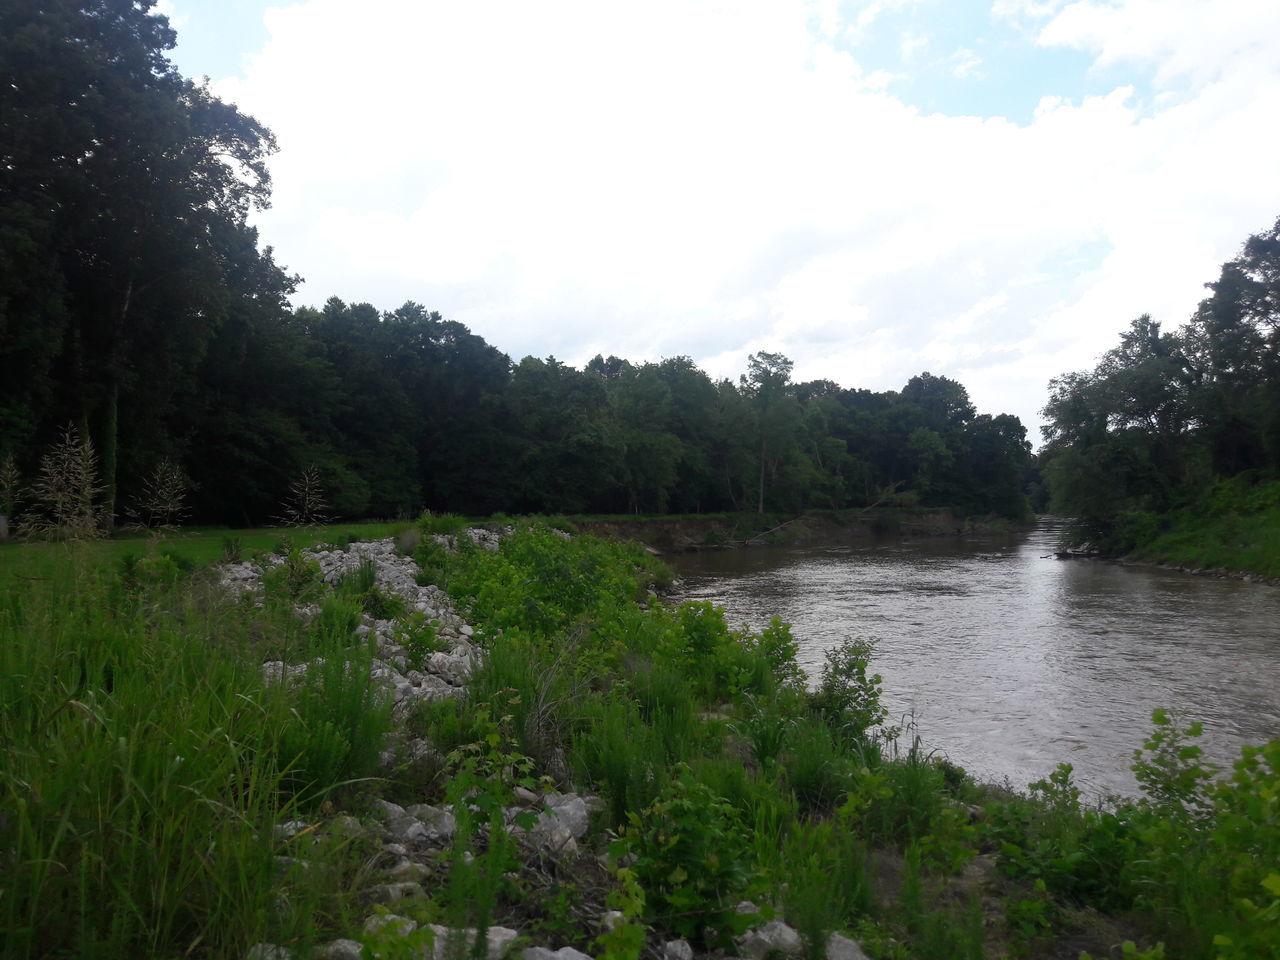 The Wolf River Collierville Tennessee Walksinthewoods WalksInThePark Relax Johnsonpark Wolf River Smartphonephotography